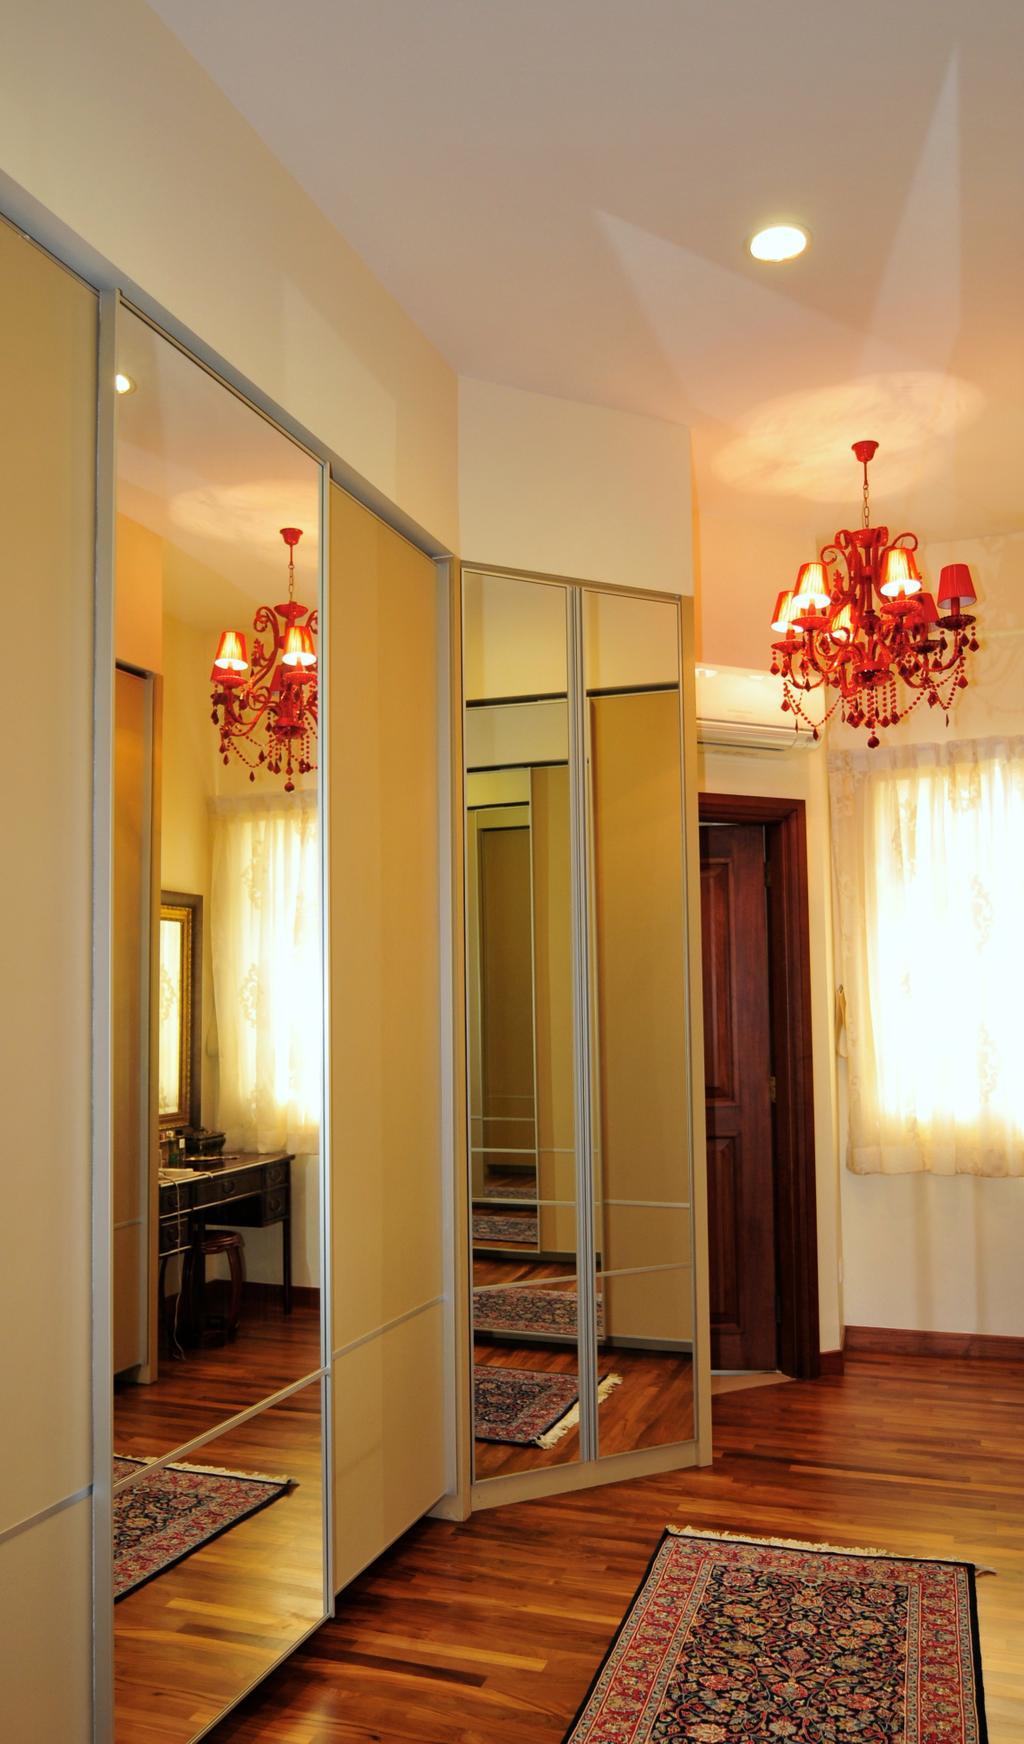 Transitional, Landed, Bedroom, Greenwood Avenue, Interior Designer, Seven Heaven, Chandelier, Lamp, Curtain, Home Decor